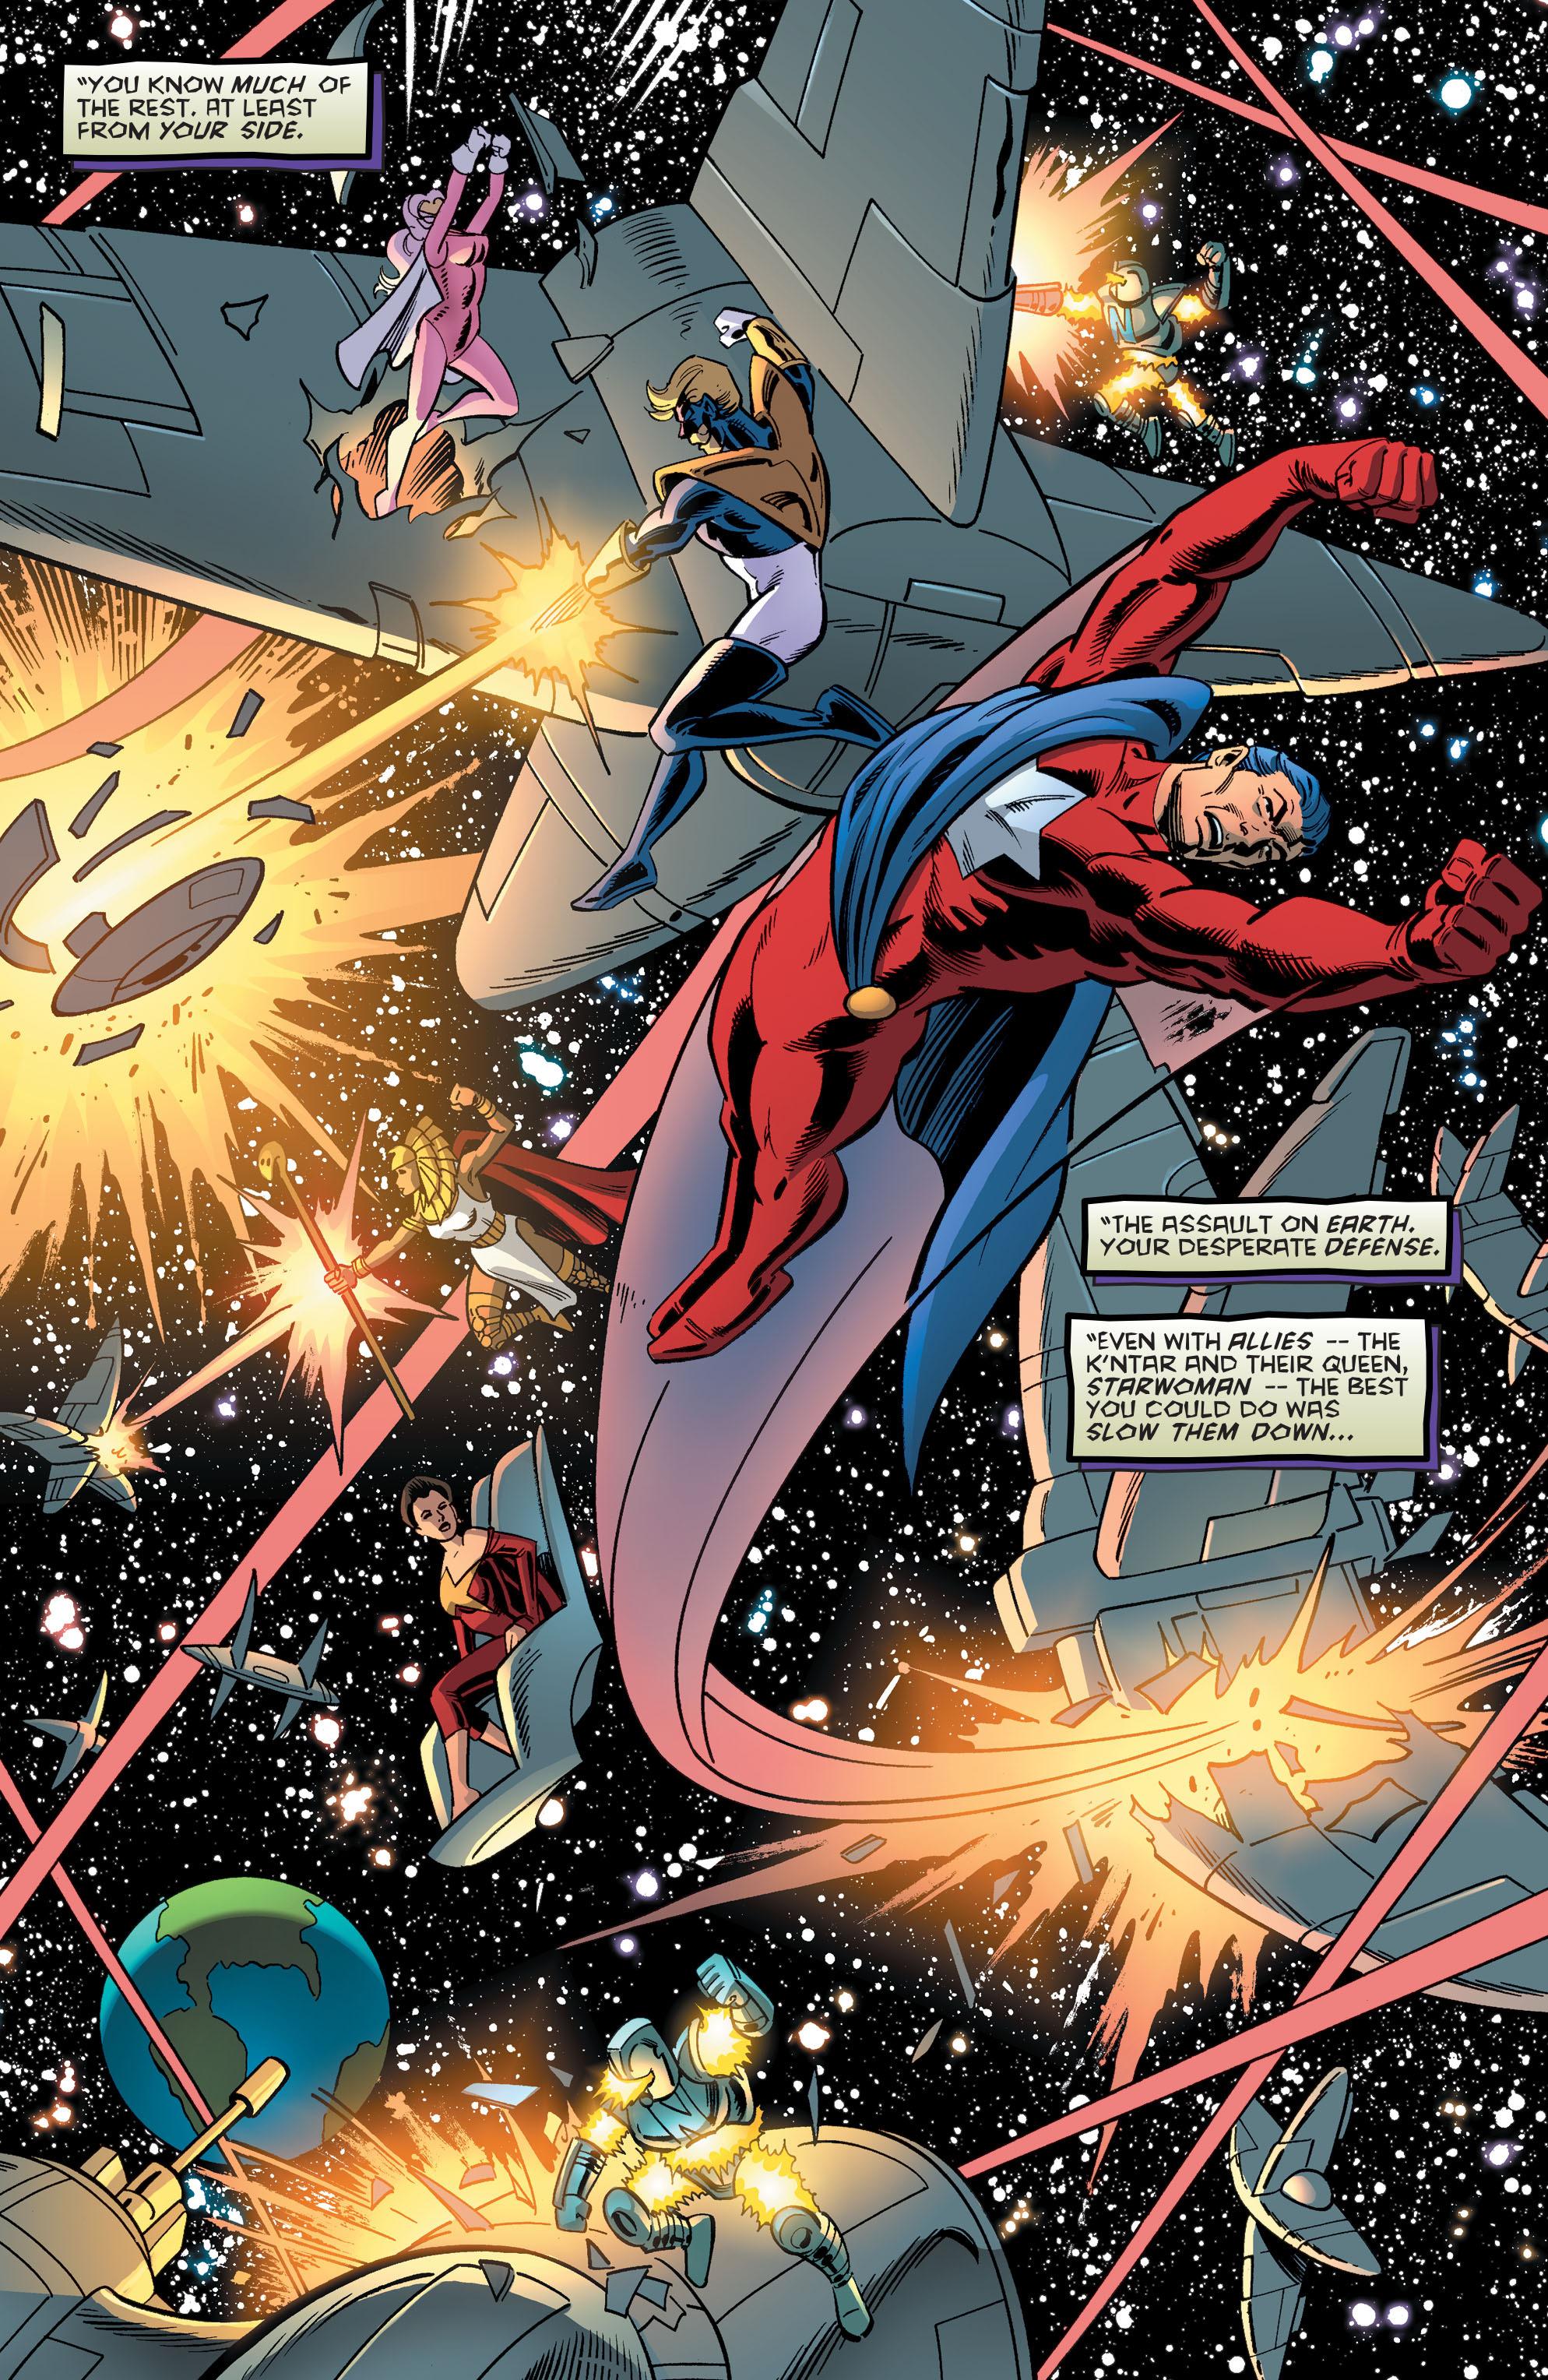 Read online Astro City comic -  Issue #17 - 18